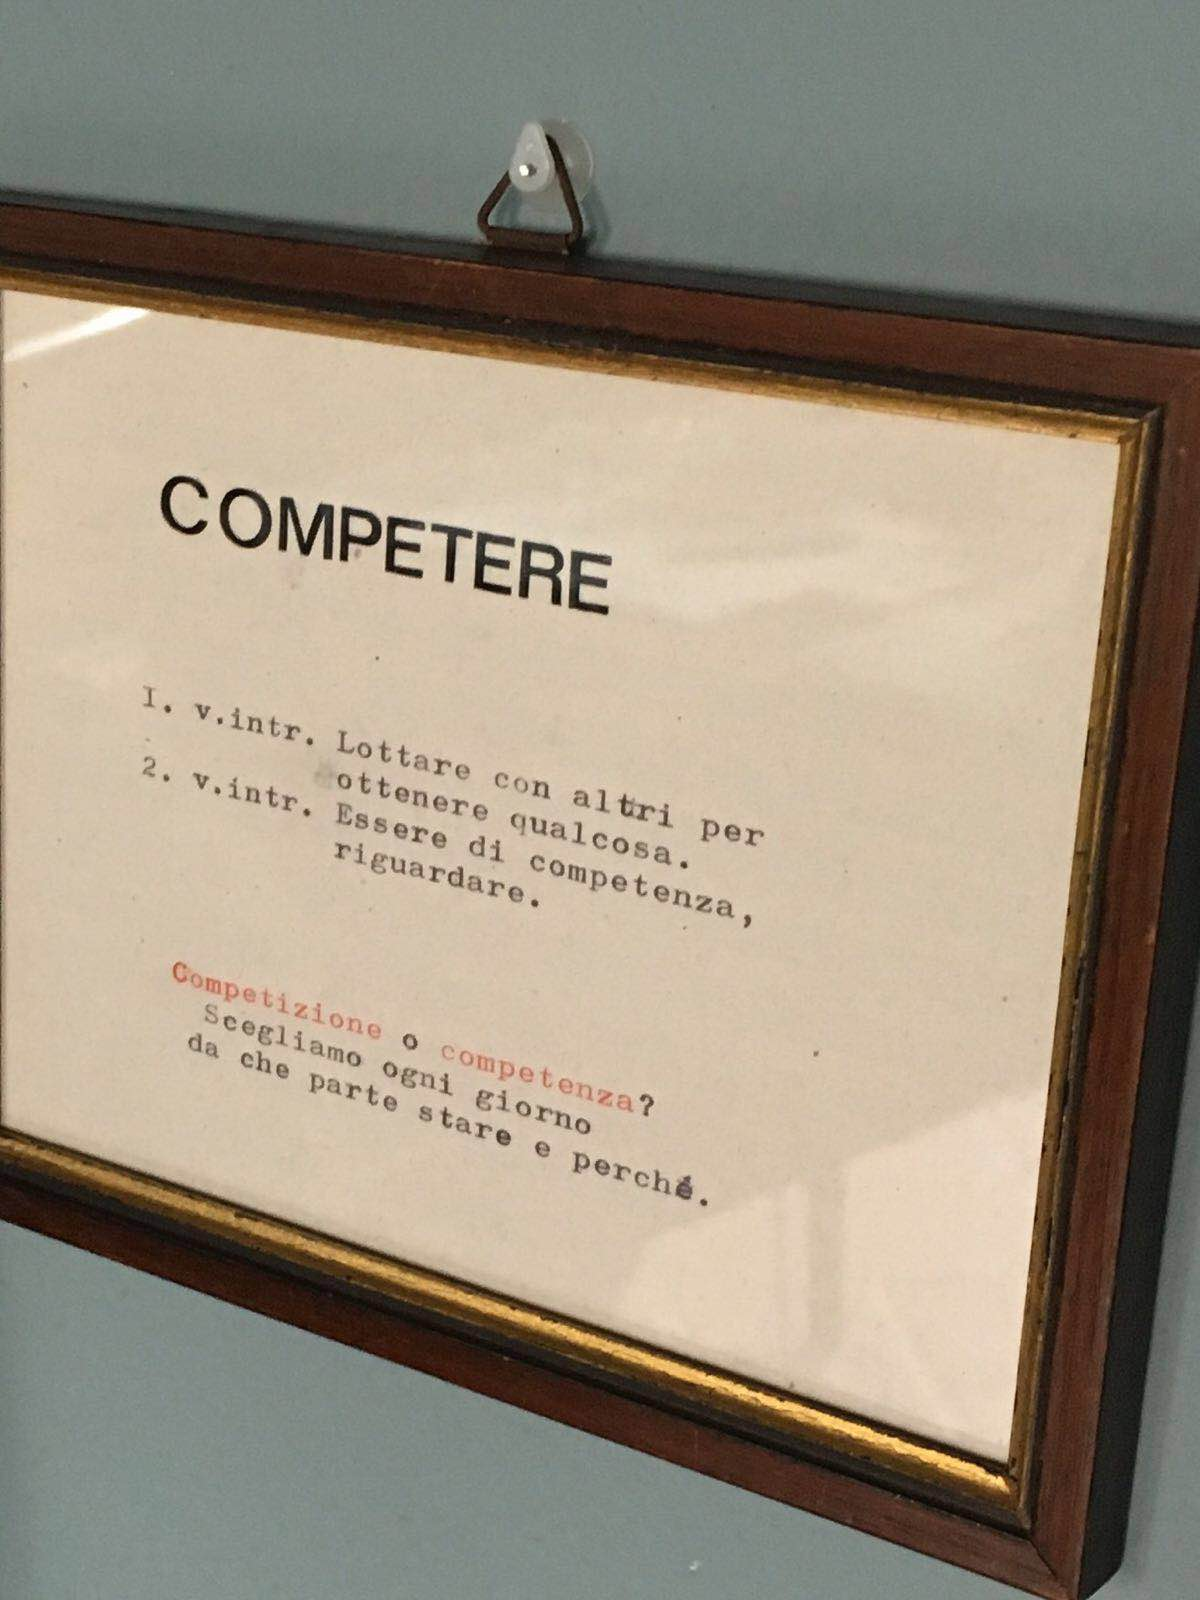 bisticci_competere_1